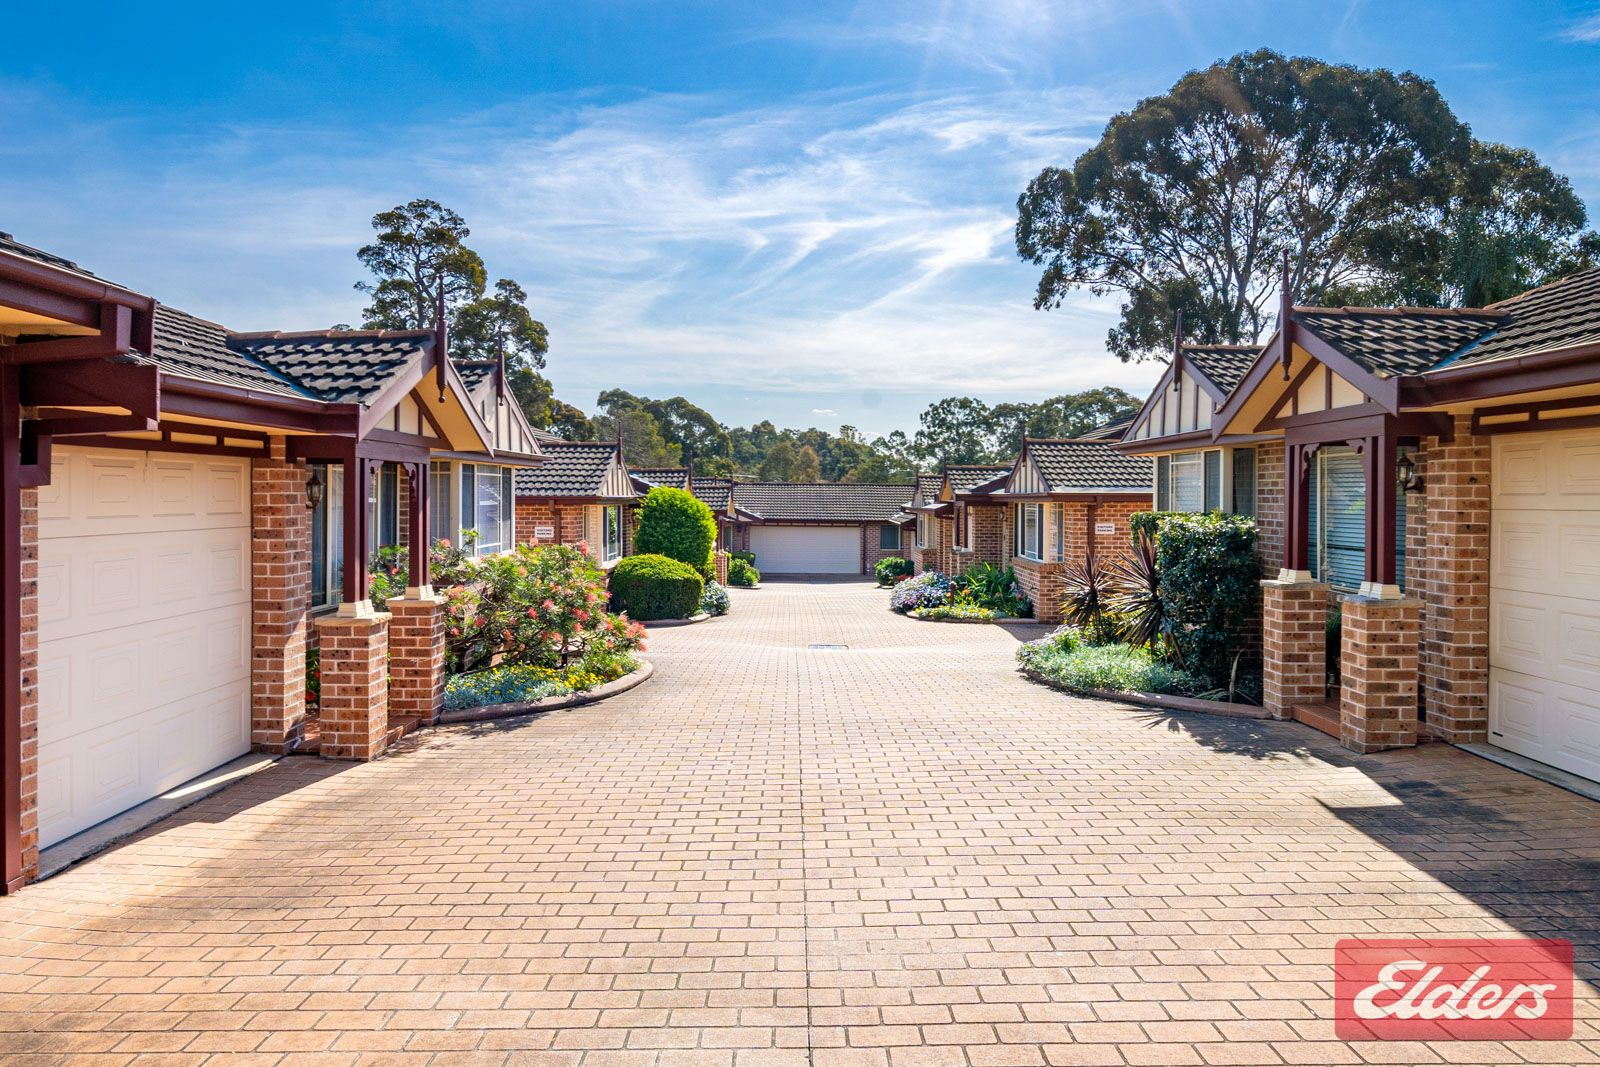 6/88 Ballandella Road, Toongabbie NSW 2146, Image 0